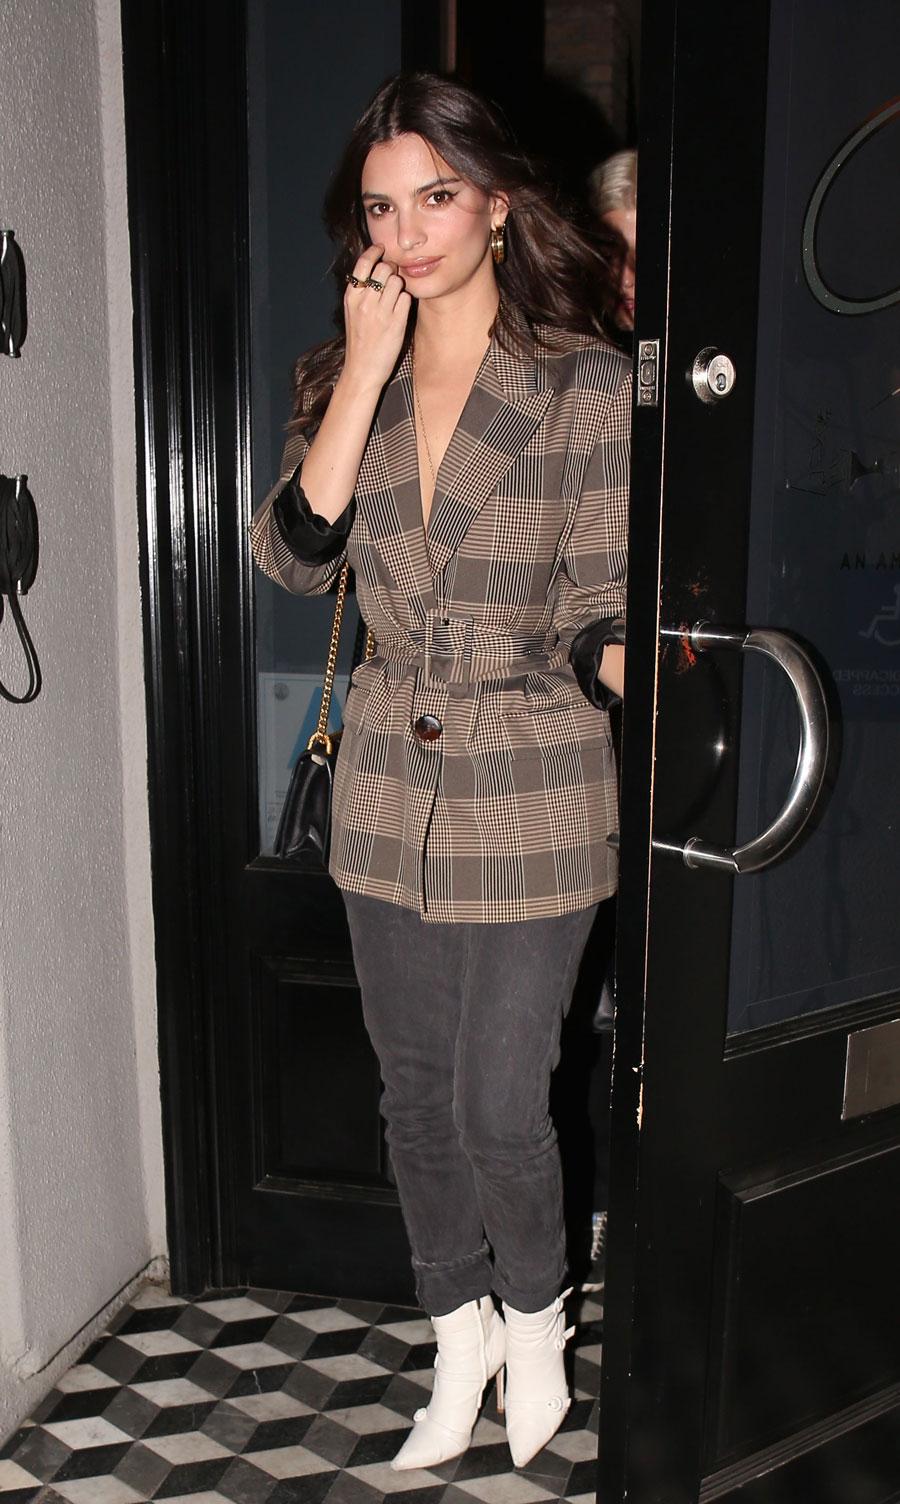 2b70ce8a6 El perfecto look de oficina de Emily Ratajkowski con blazer de Zara ...